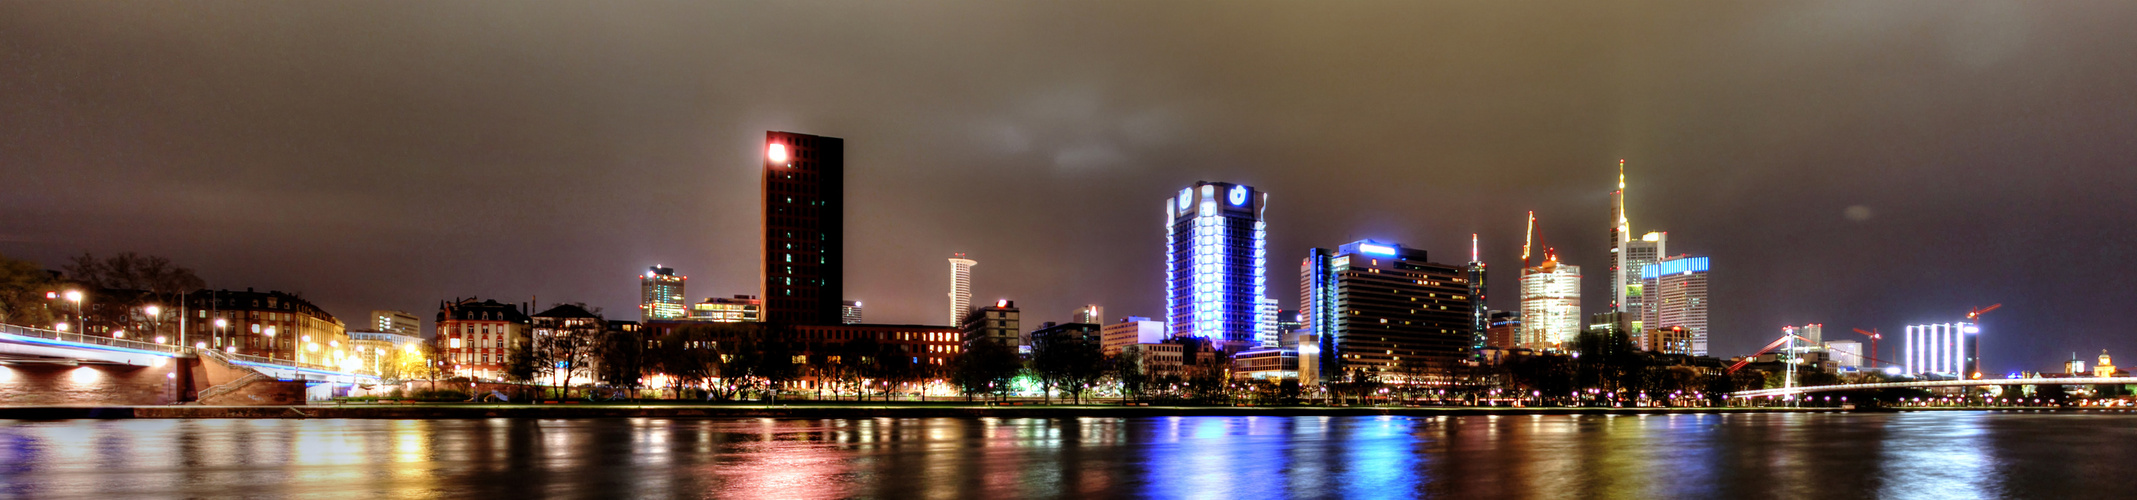 Frankfurts Skyline bei Nacht